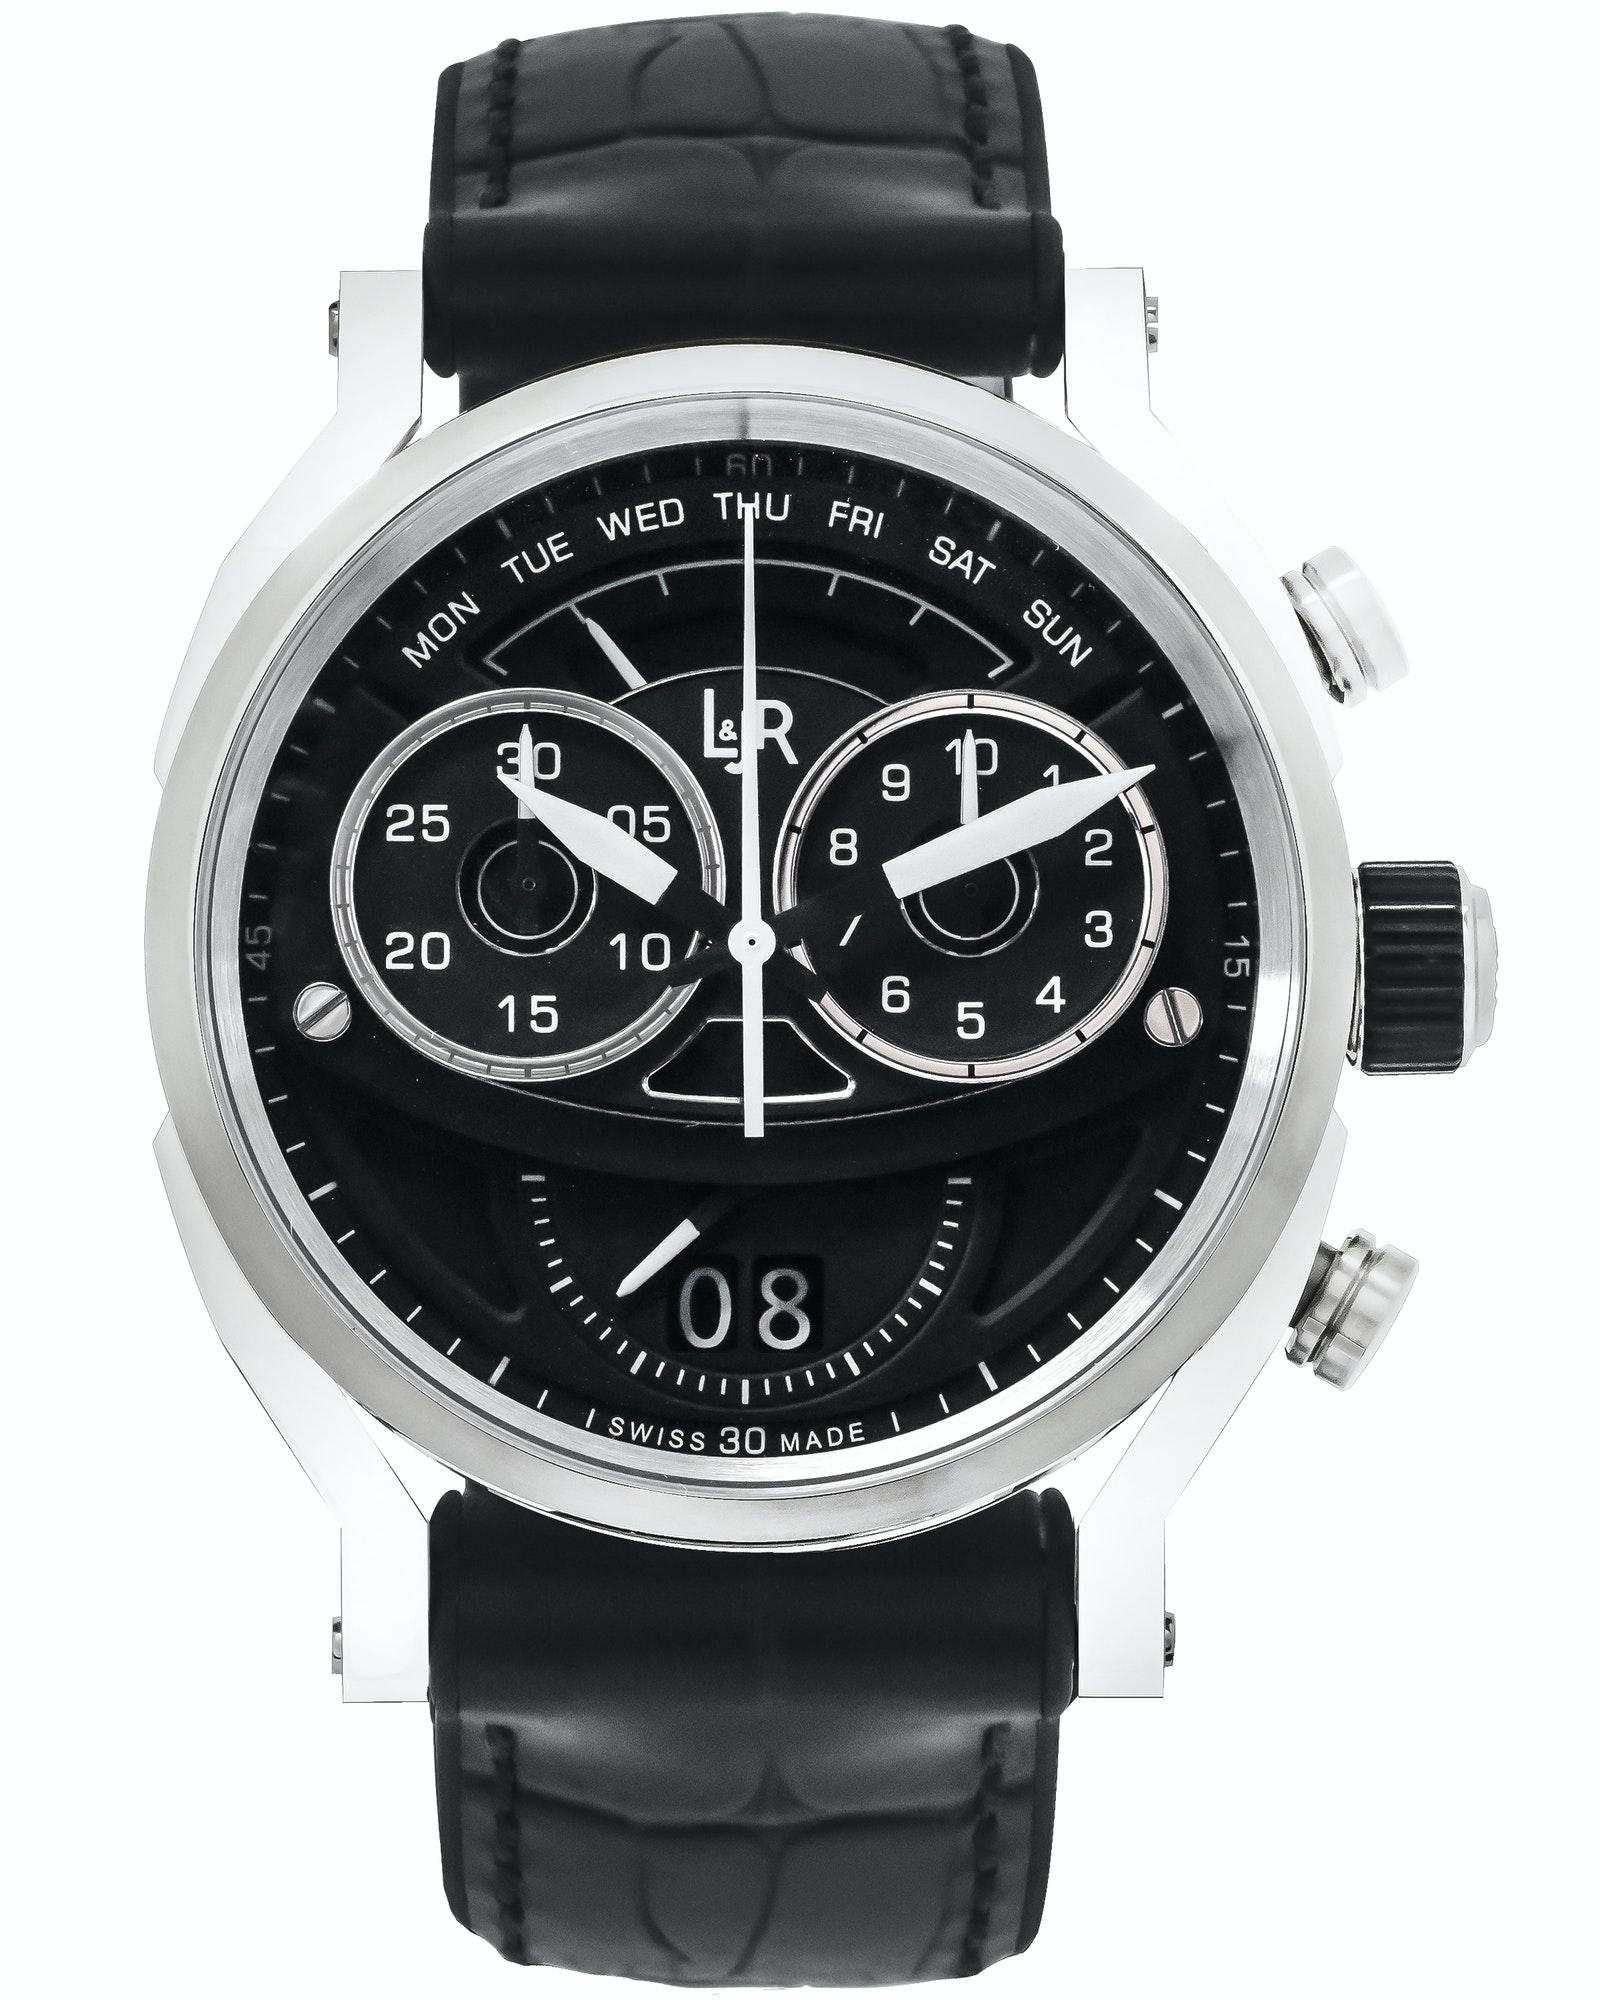 L&JR Big Date Retrograde Day Quartz Chronograph Watch $350 each + free s/h